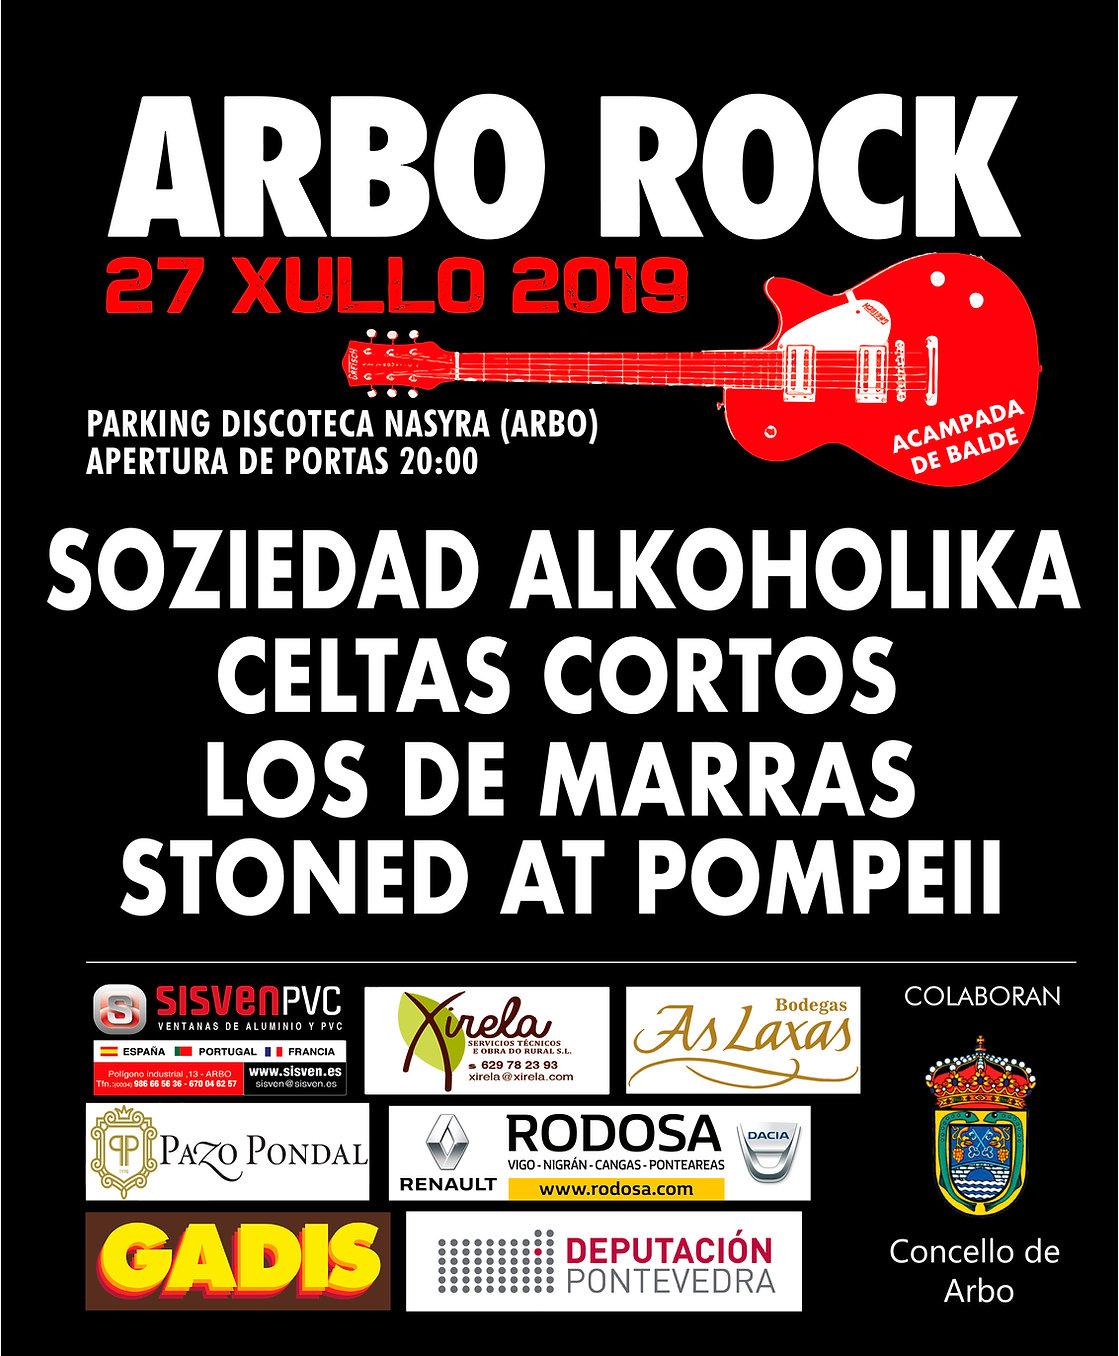 Cartel Arbo Rock 2019.jpg